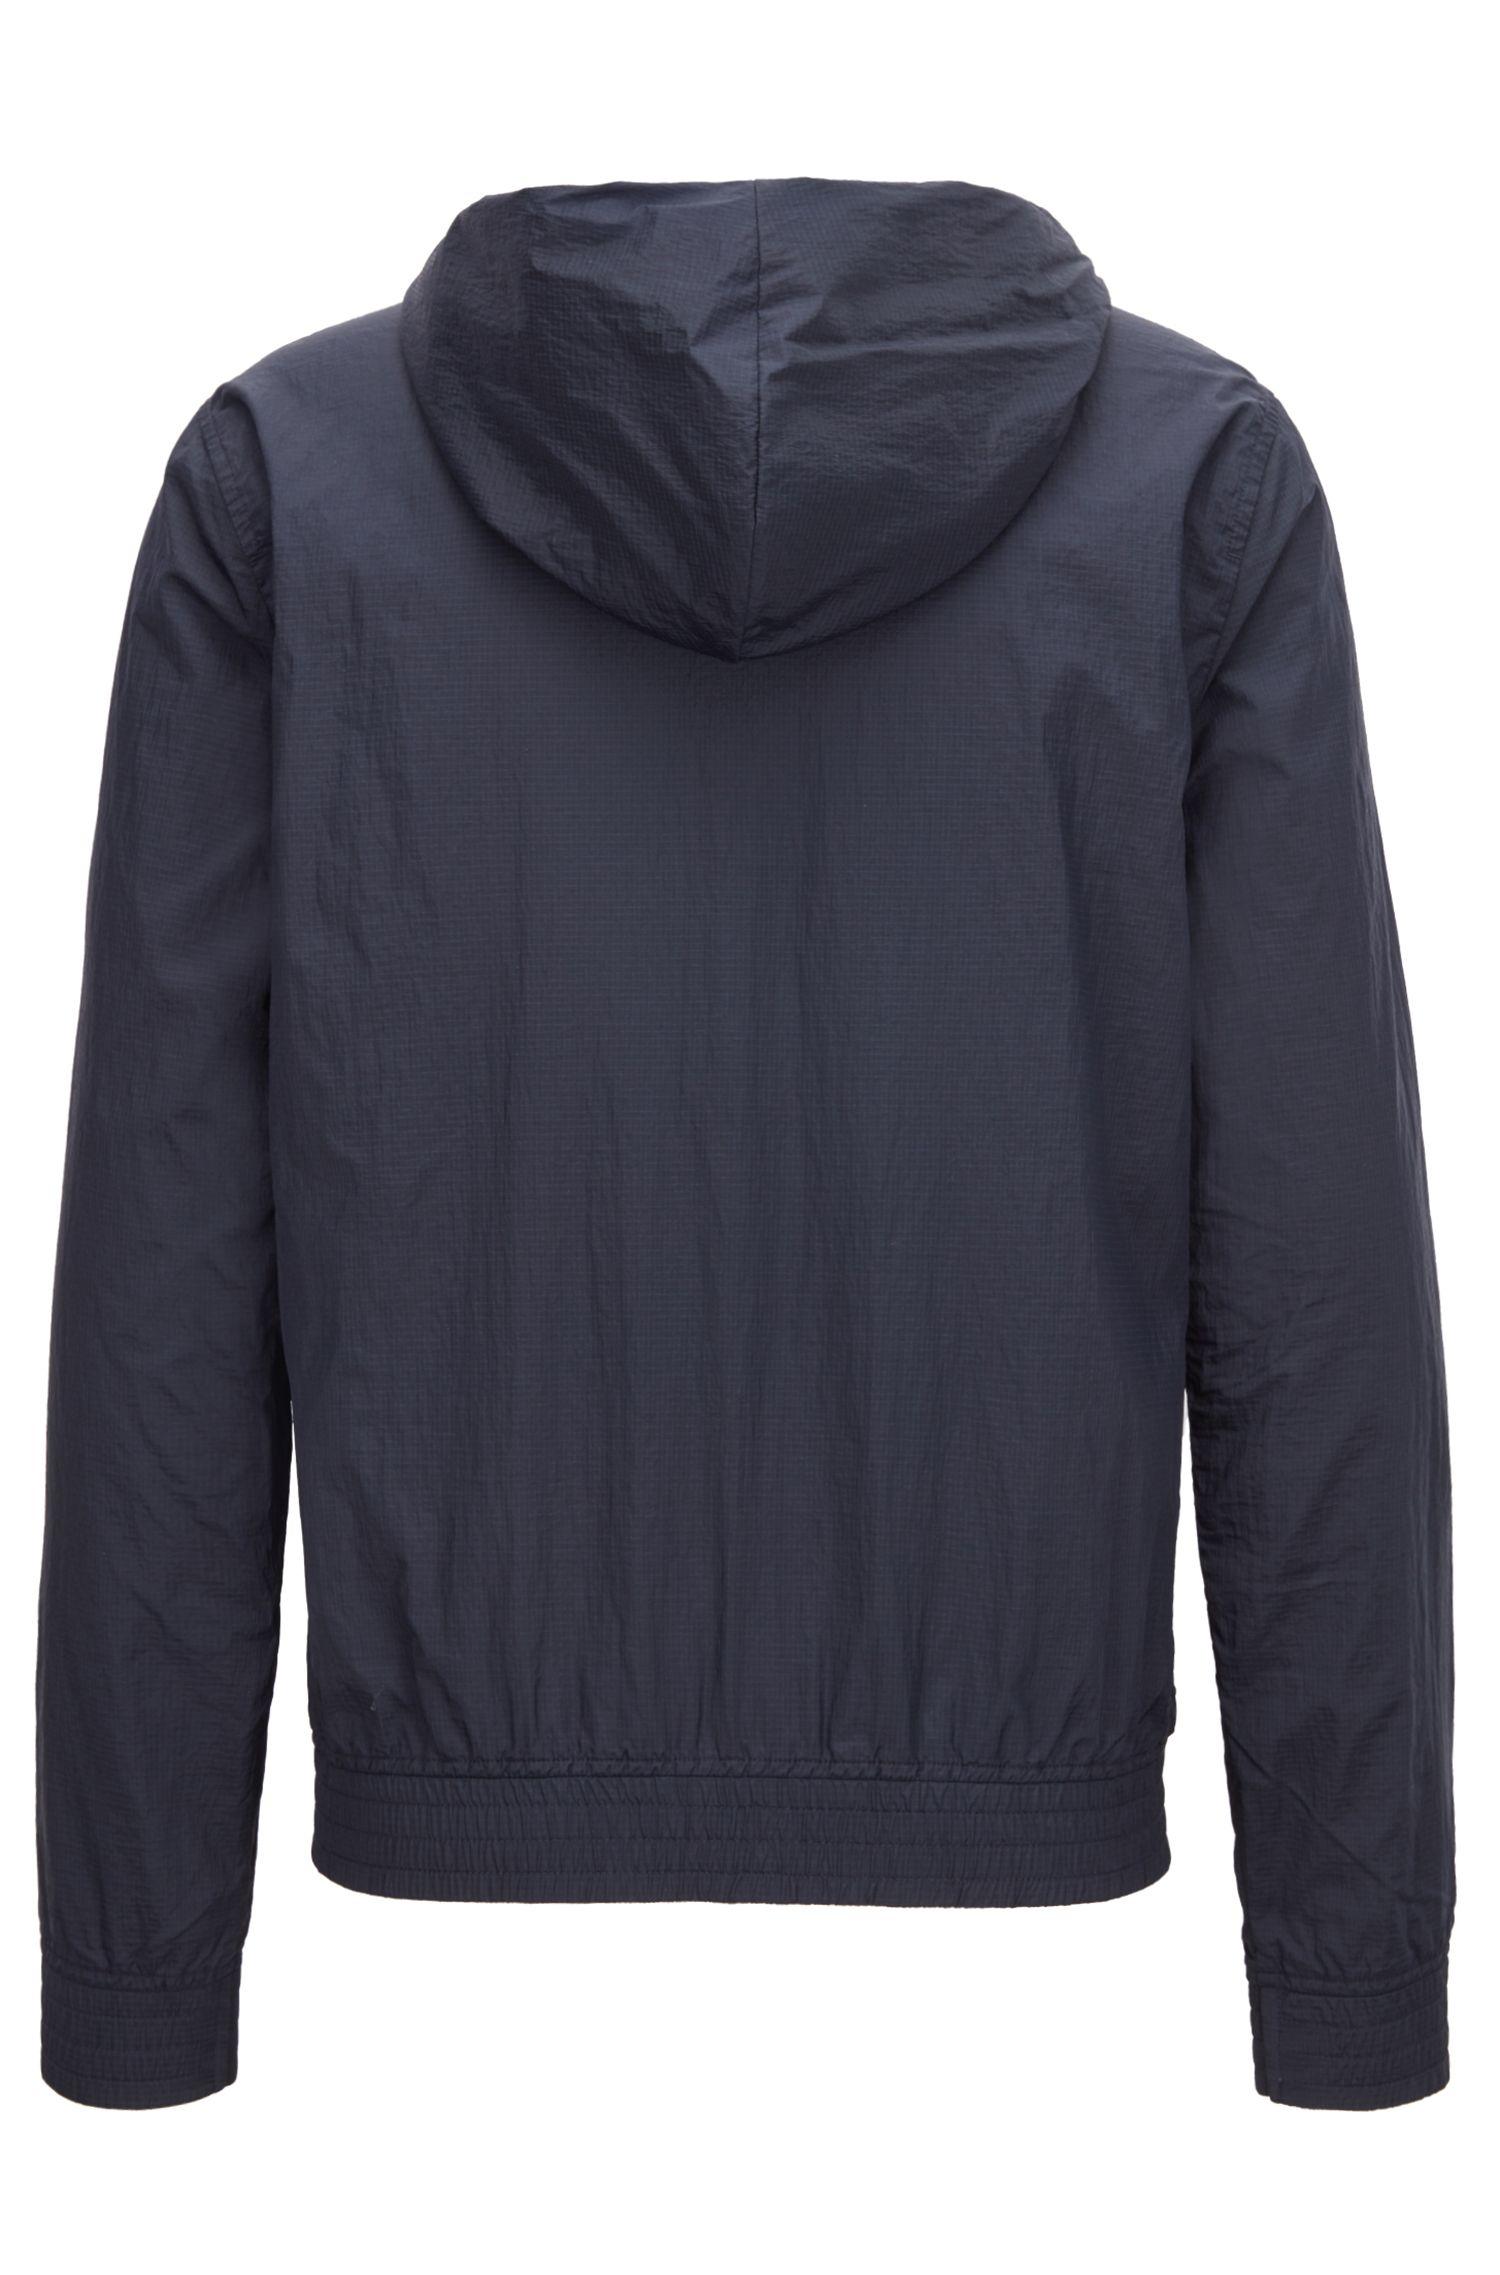 Reversible jacket with drawstring hood, Black